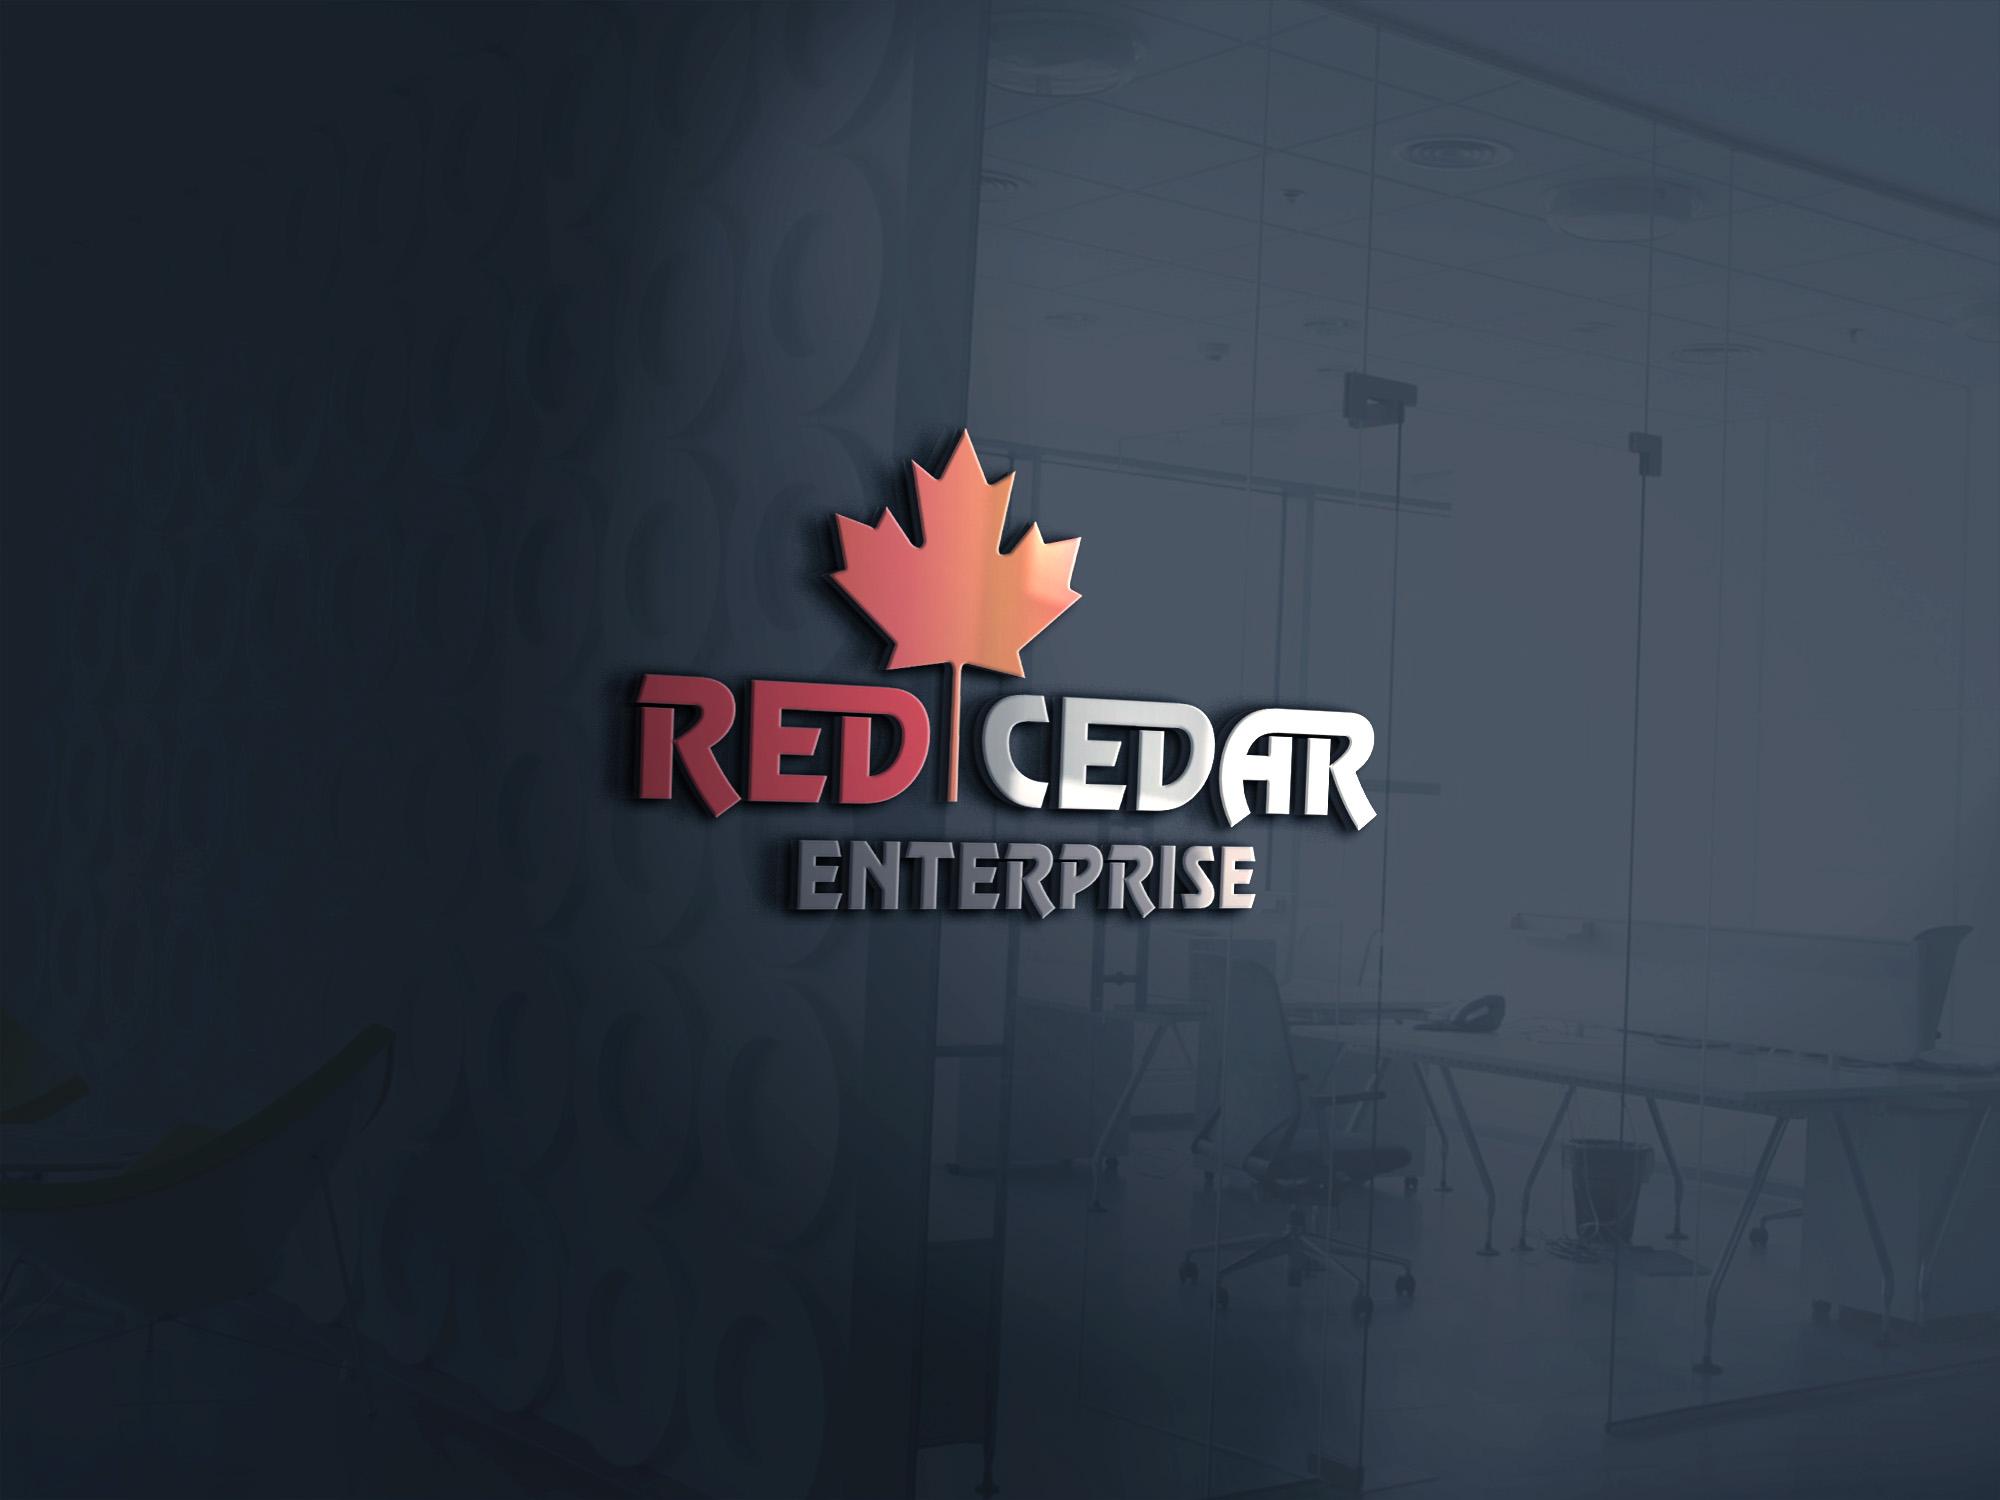 Logo Design by umair - Entry No. 41 in the Logo Design Contest Unique Logo Design Wanted for Red Cedar Enterprise.